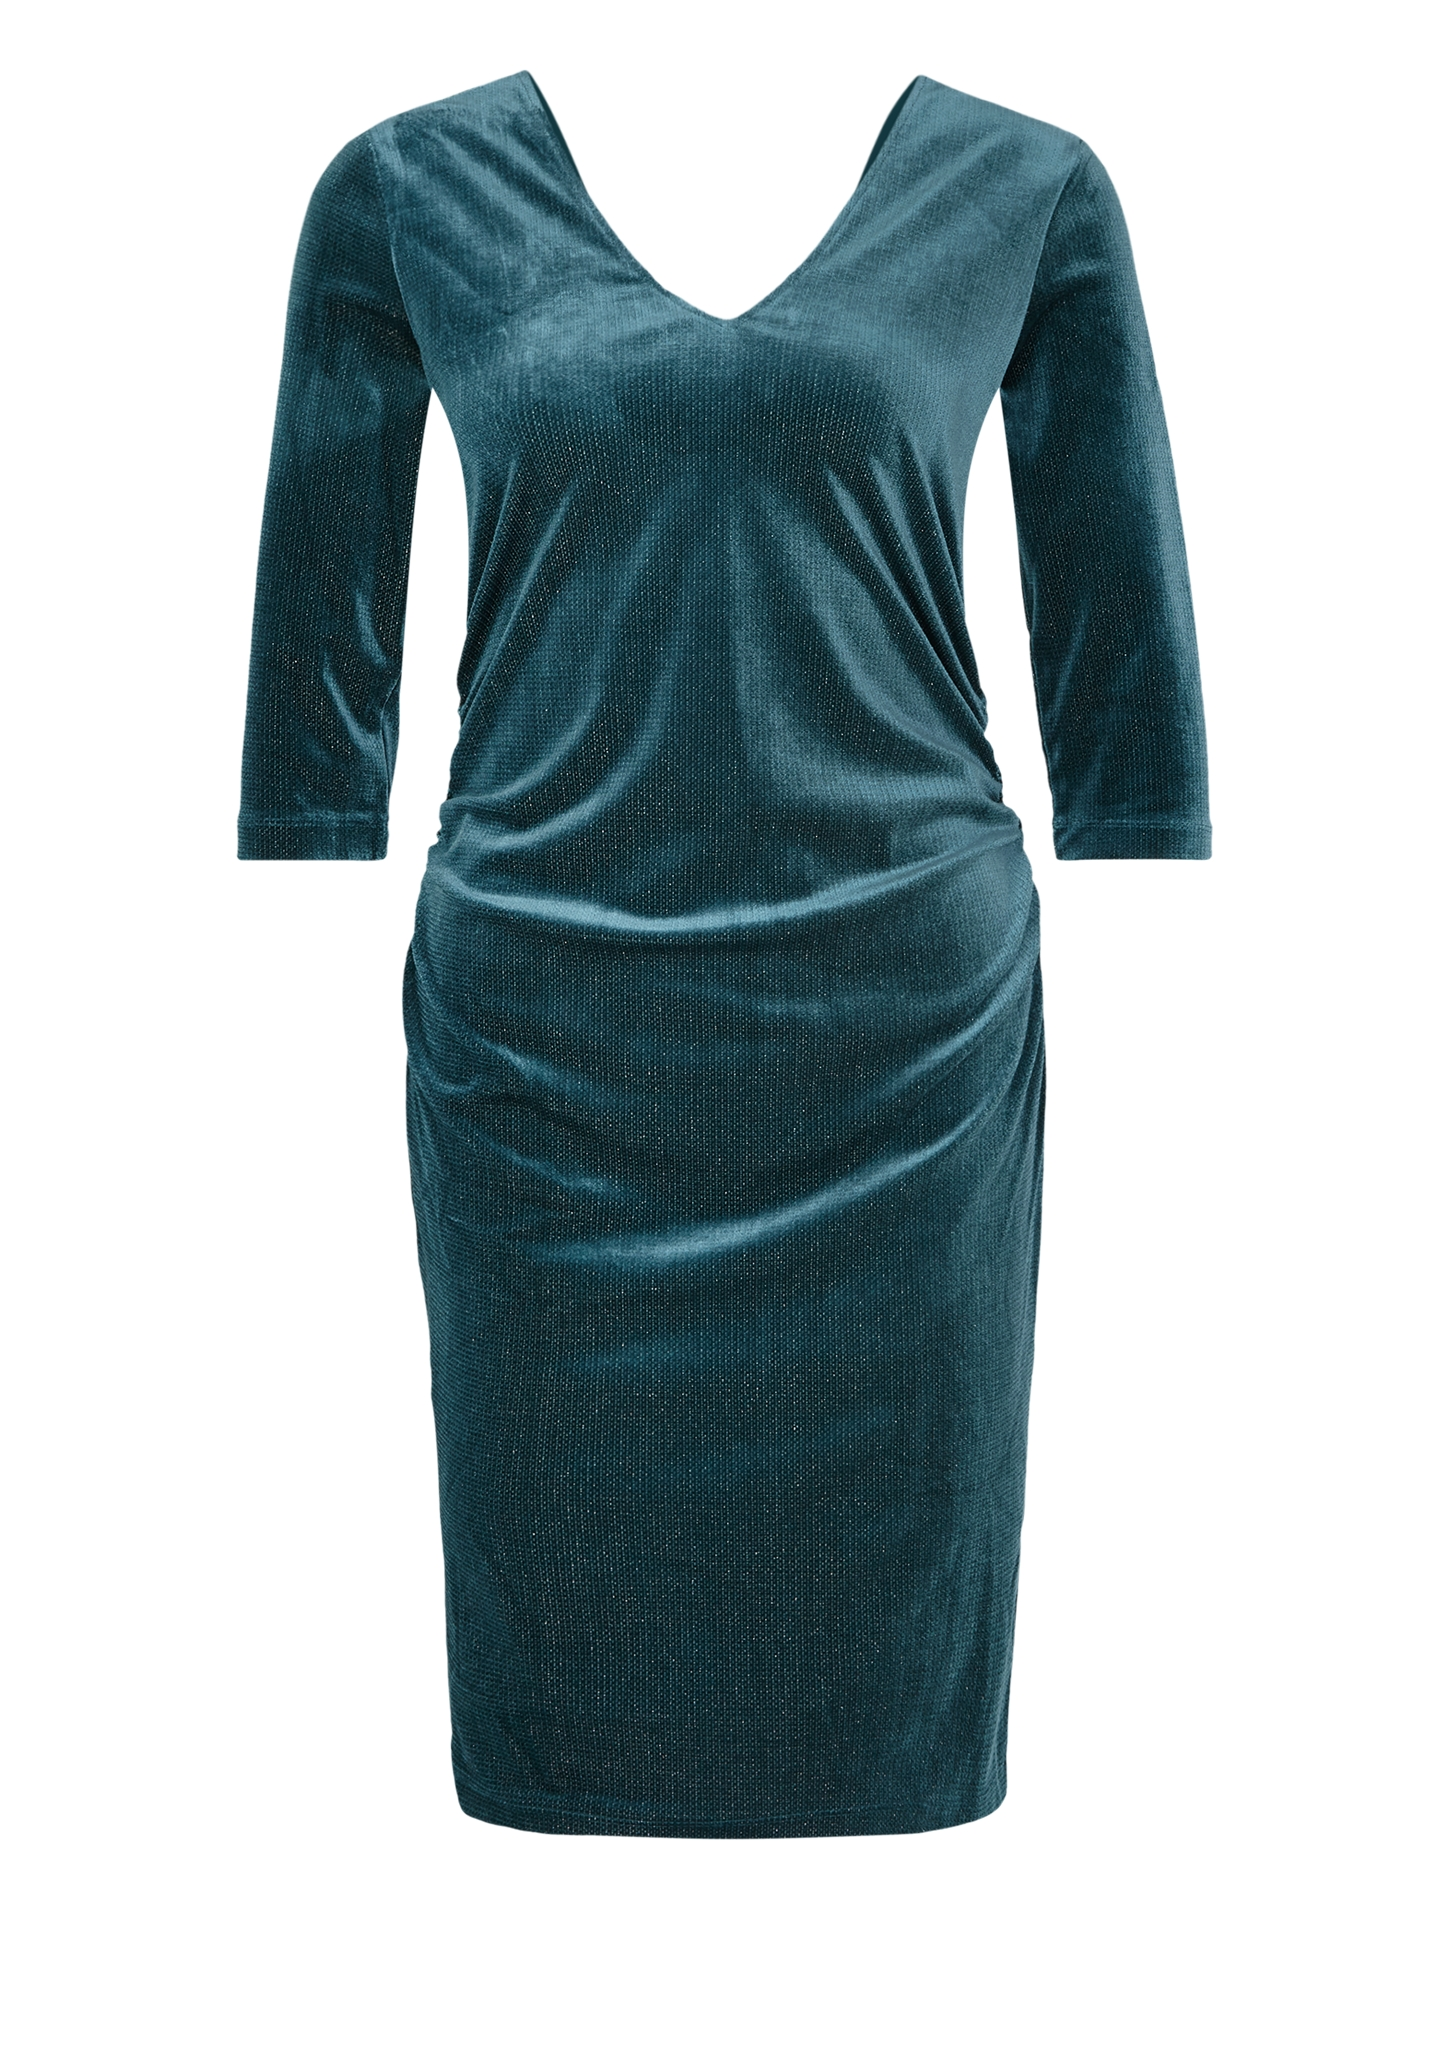 Abendkleid | Bekleidung > Kleider > Abendkleider | Grün | Obermaterial 92% polyester -  5% elasthan -  3% metallisiertes garn| futter 100% polyester | s.Oliver BLACK LABEL